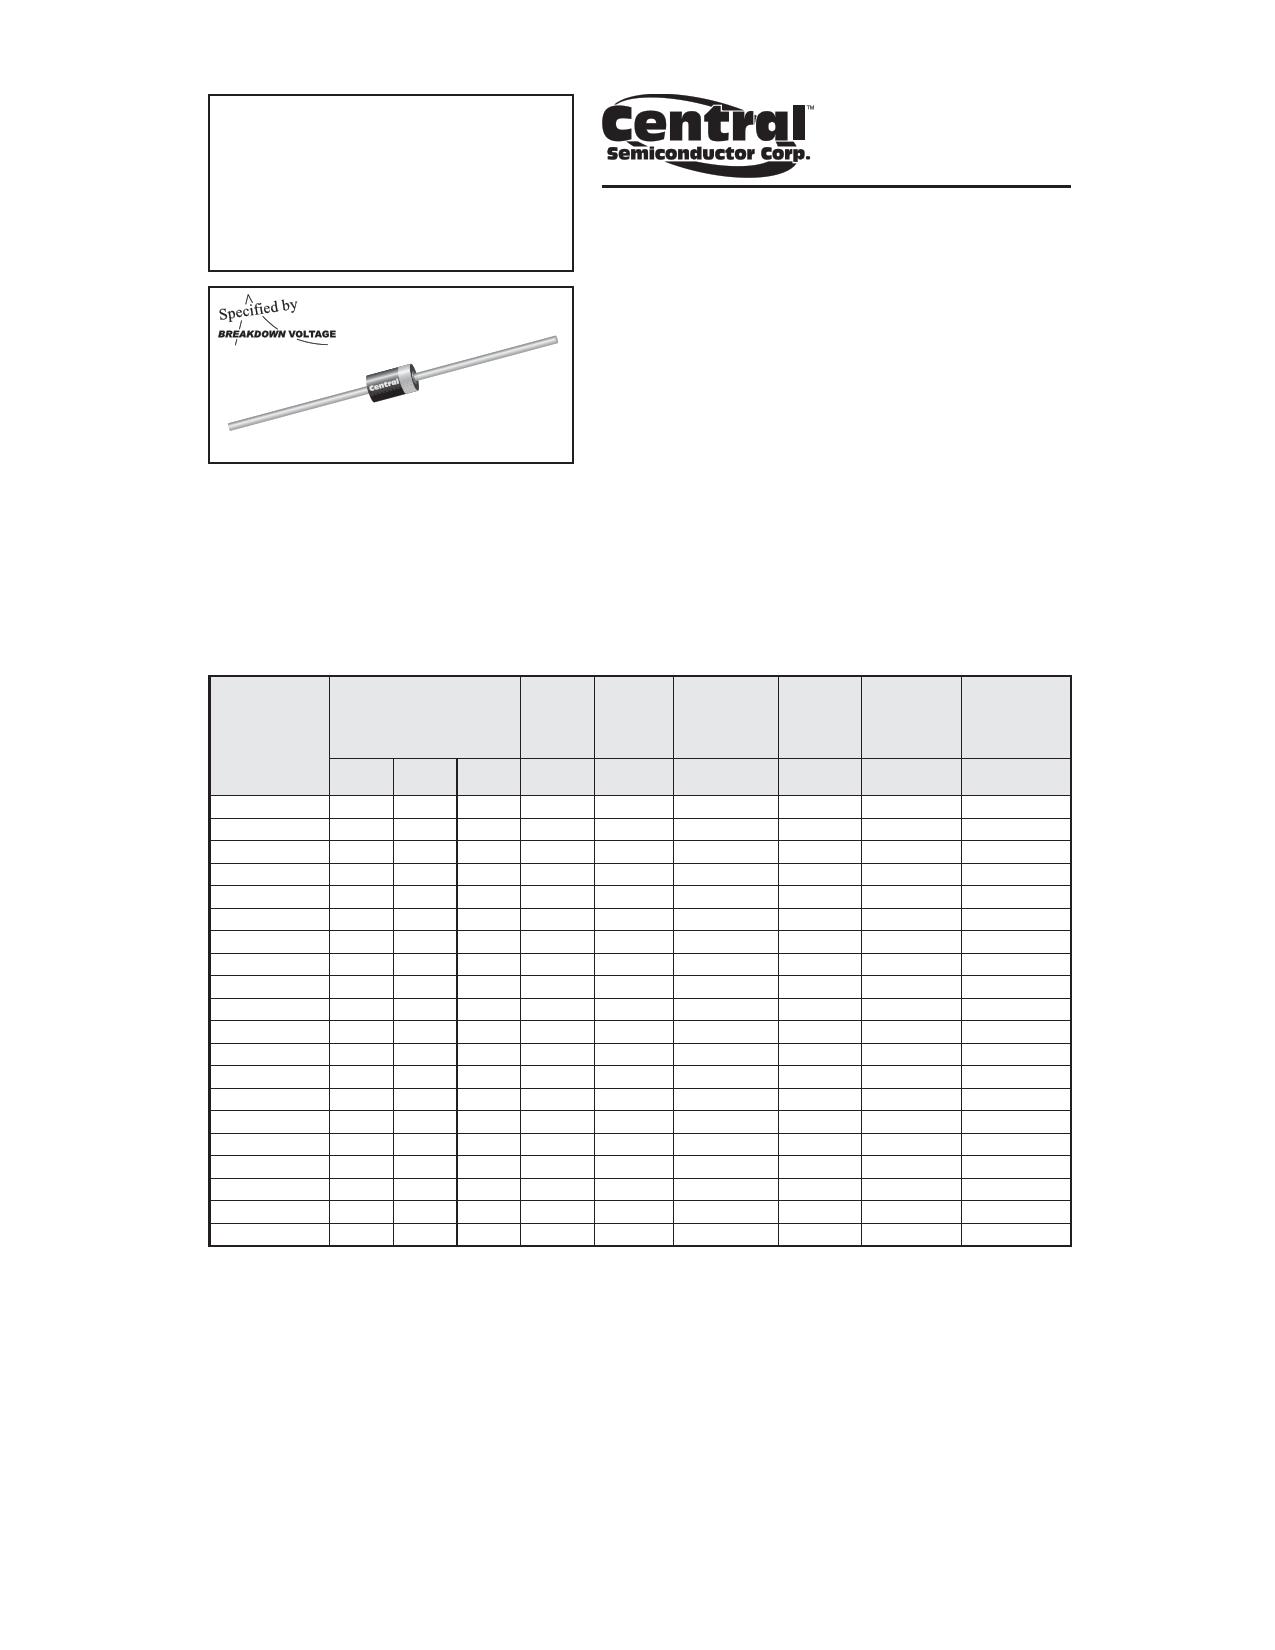 1.5CE13A datasheet